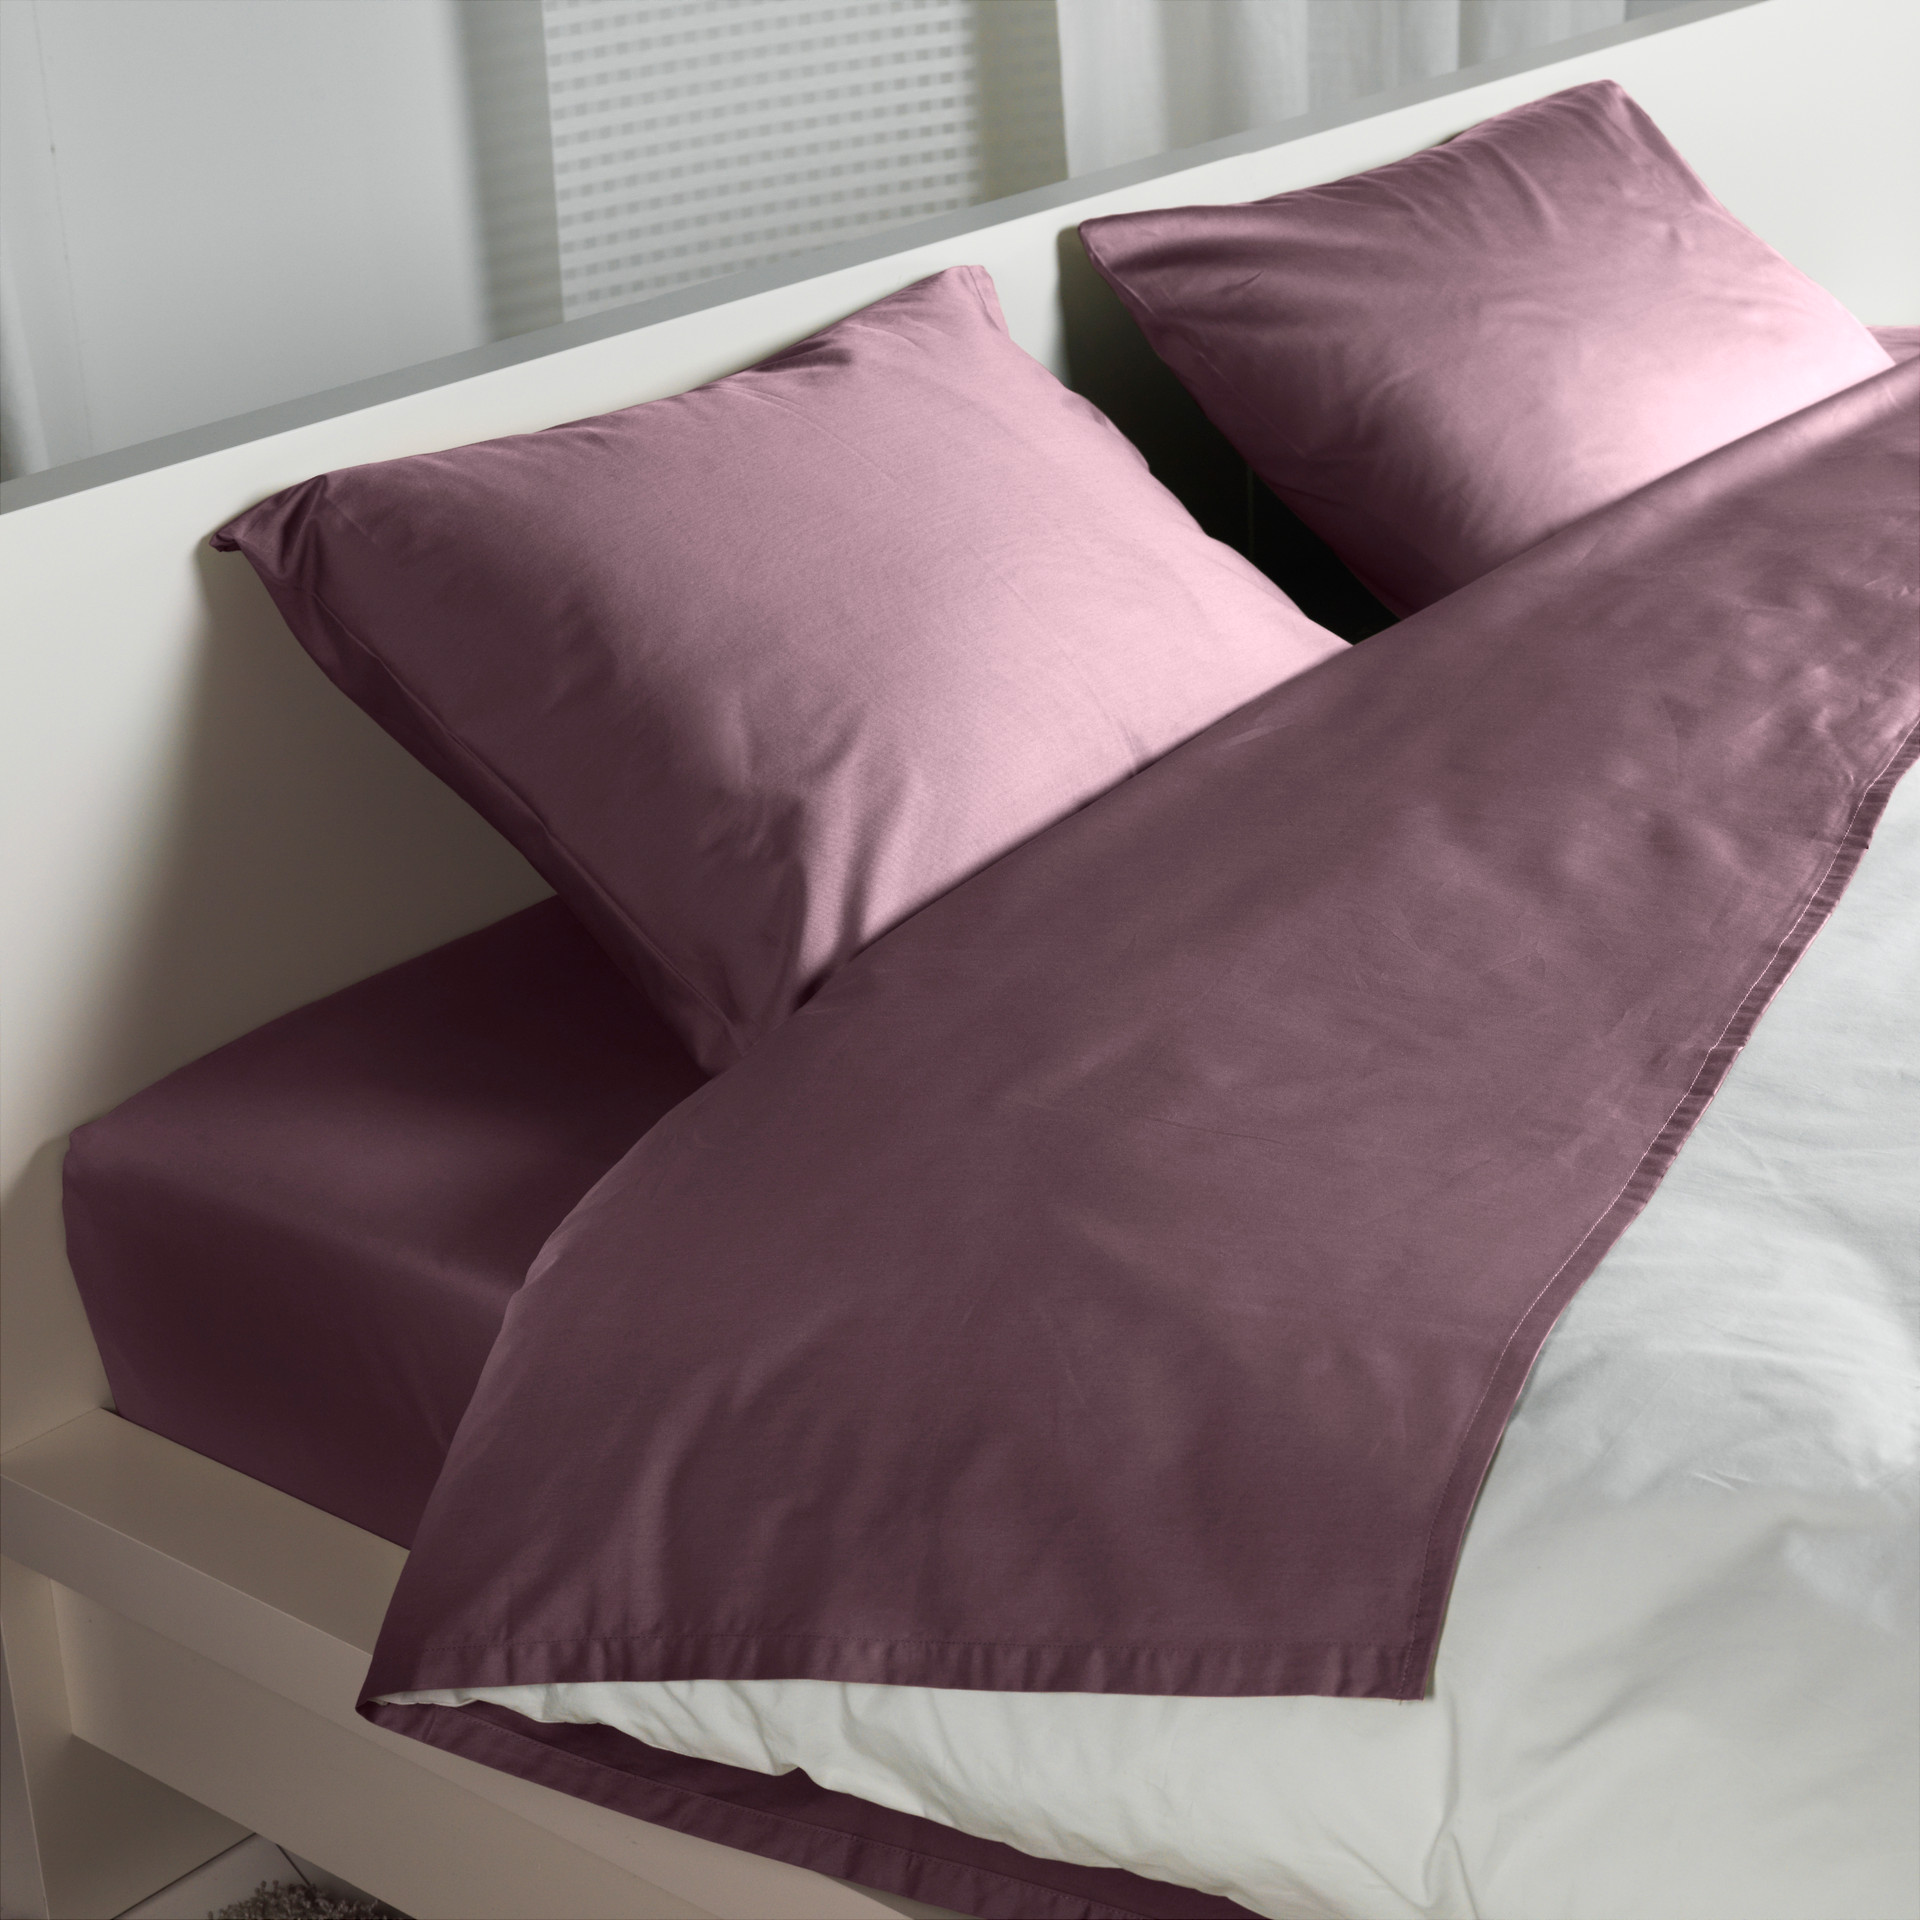 GÄSPA Sheet set - Queen - IKEA